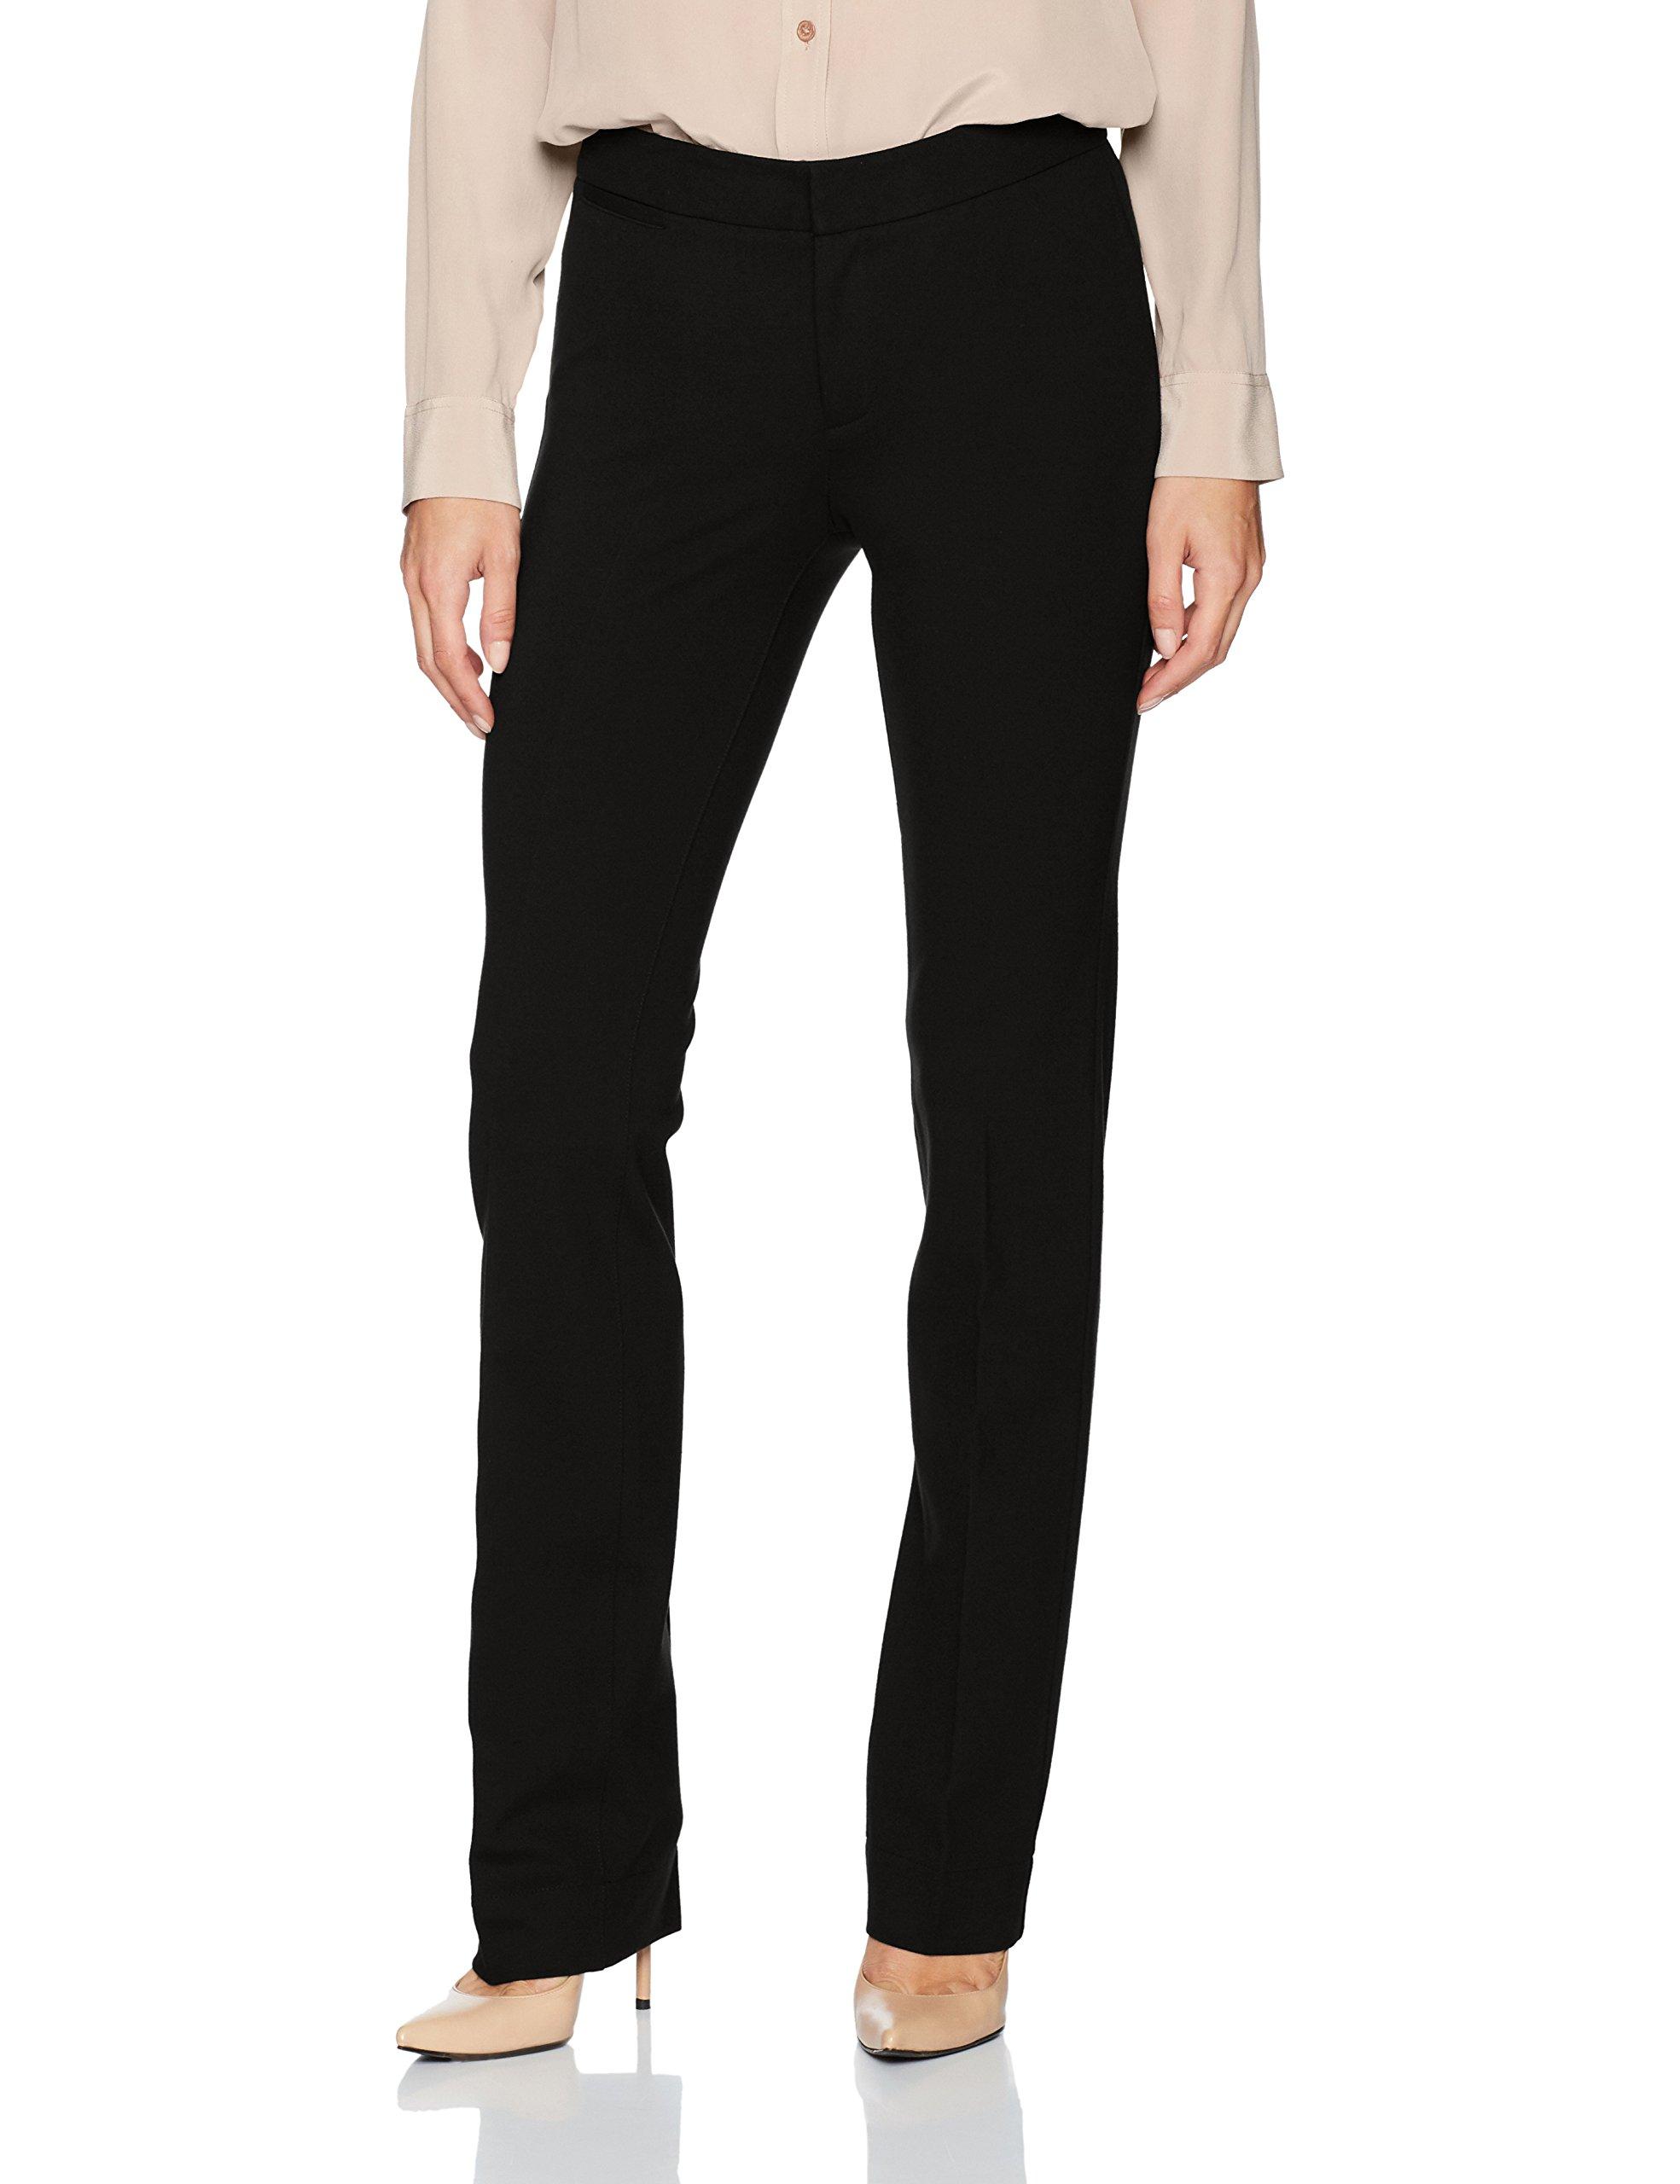 NYDJ Women's Ponte Trouser Pant, Black, 10 by NYDJ